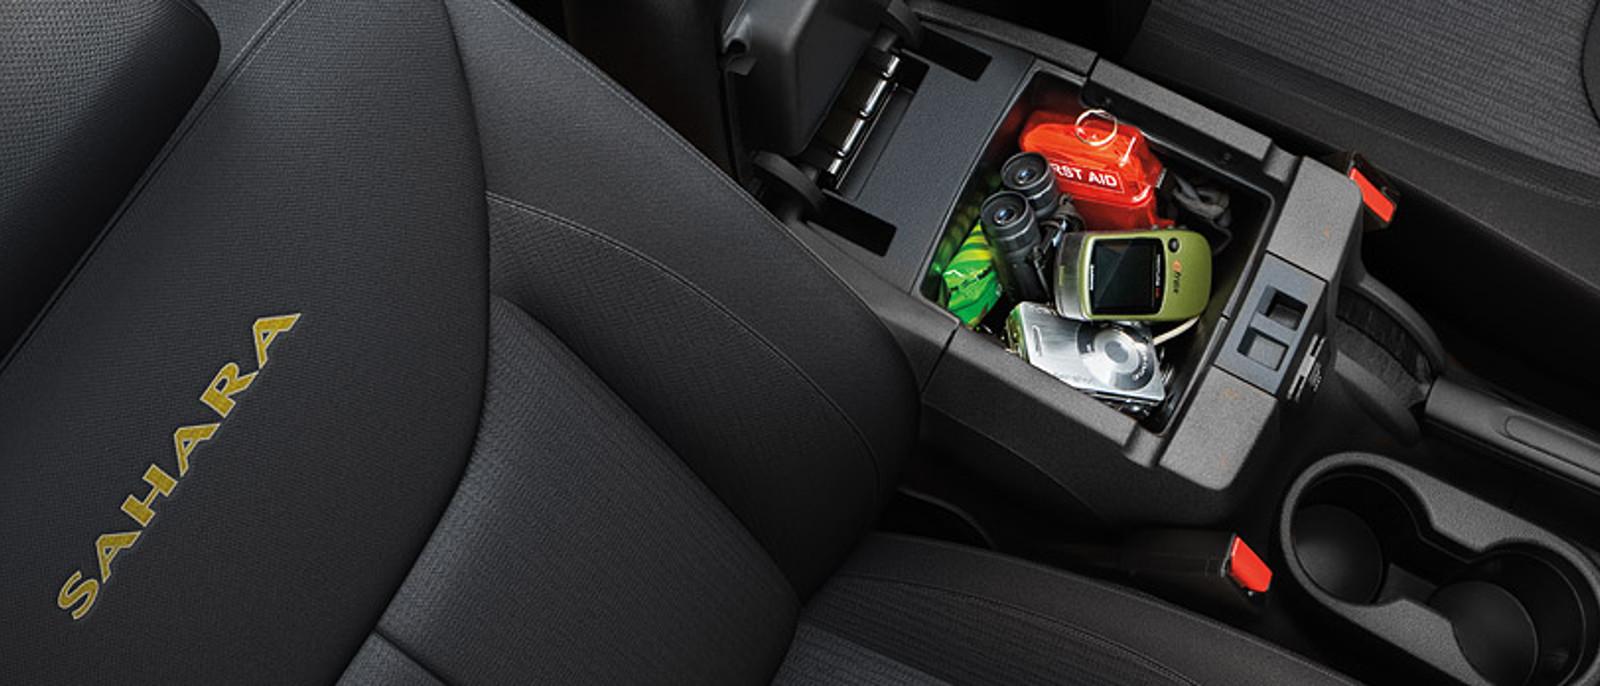 2015 Jeep wrangler interior